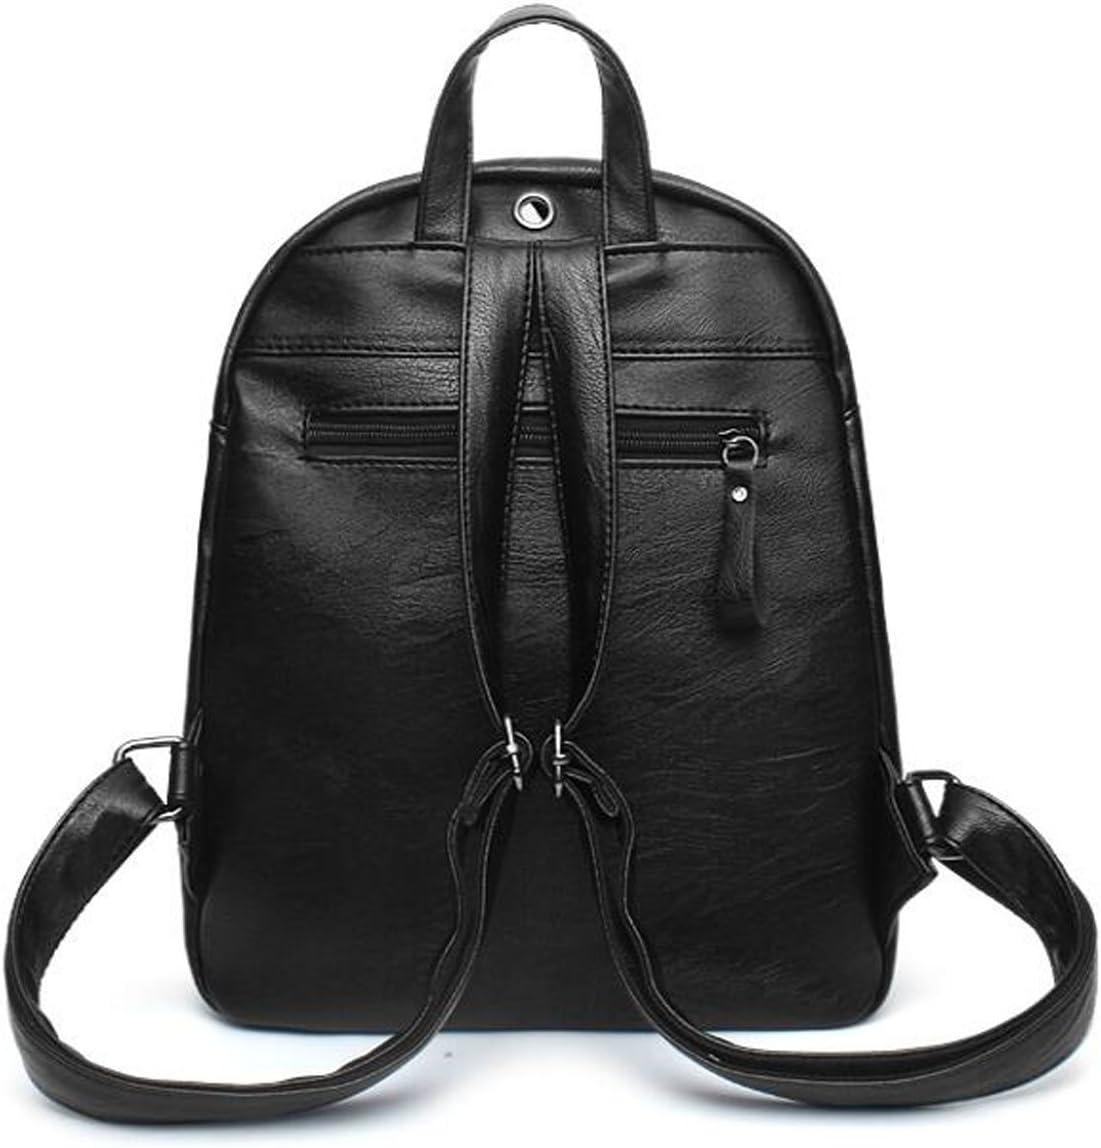 EAMIYA Girl Backpack Students Leisure Trends Fashion Travel Bags PU school Bag,Black